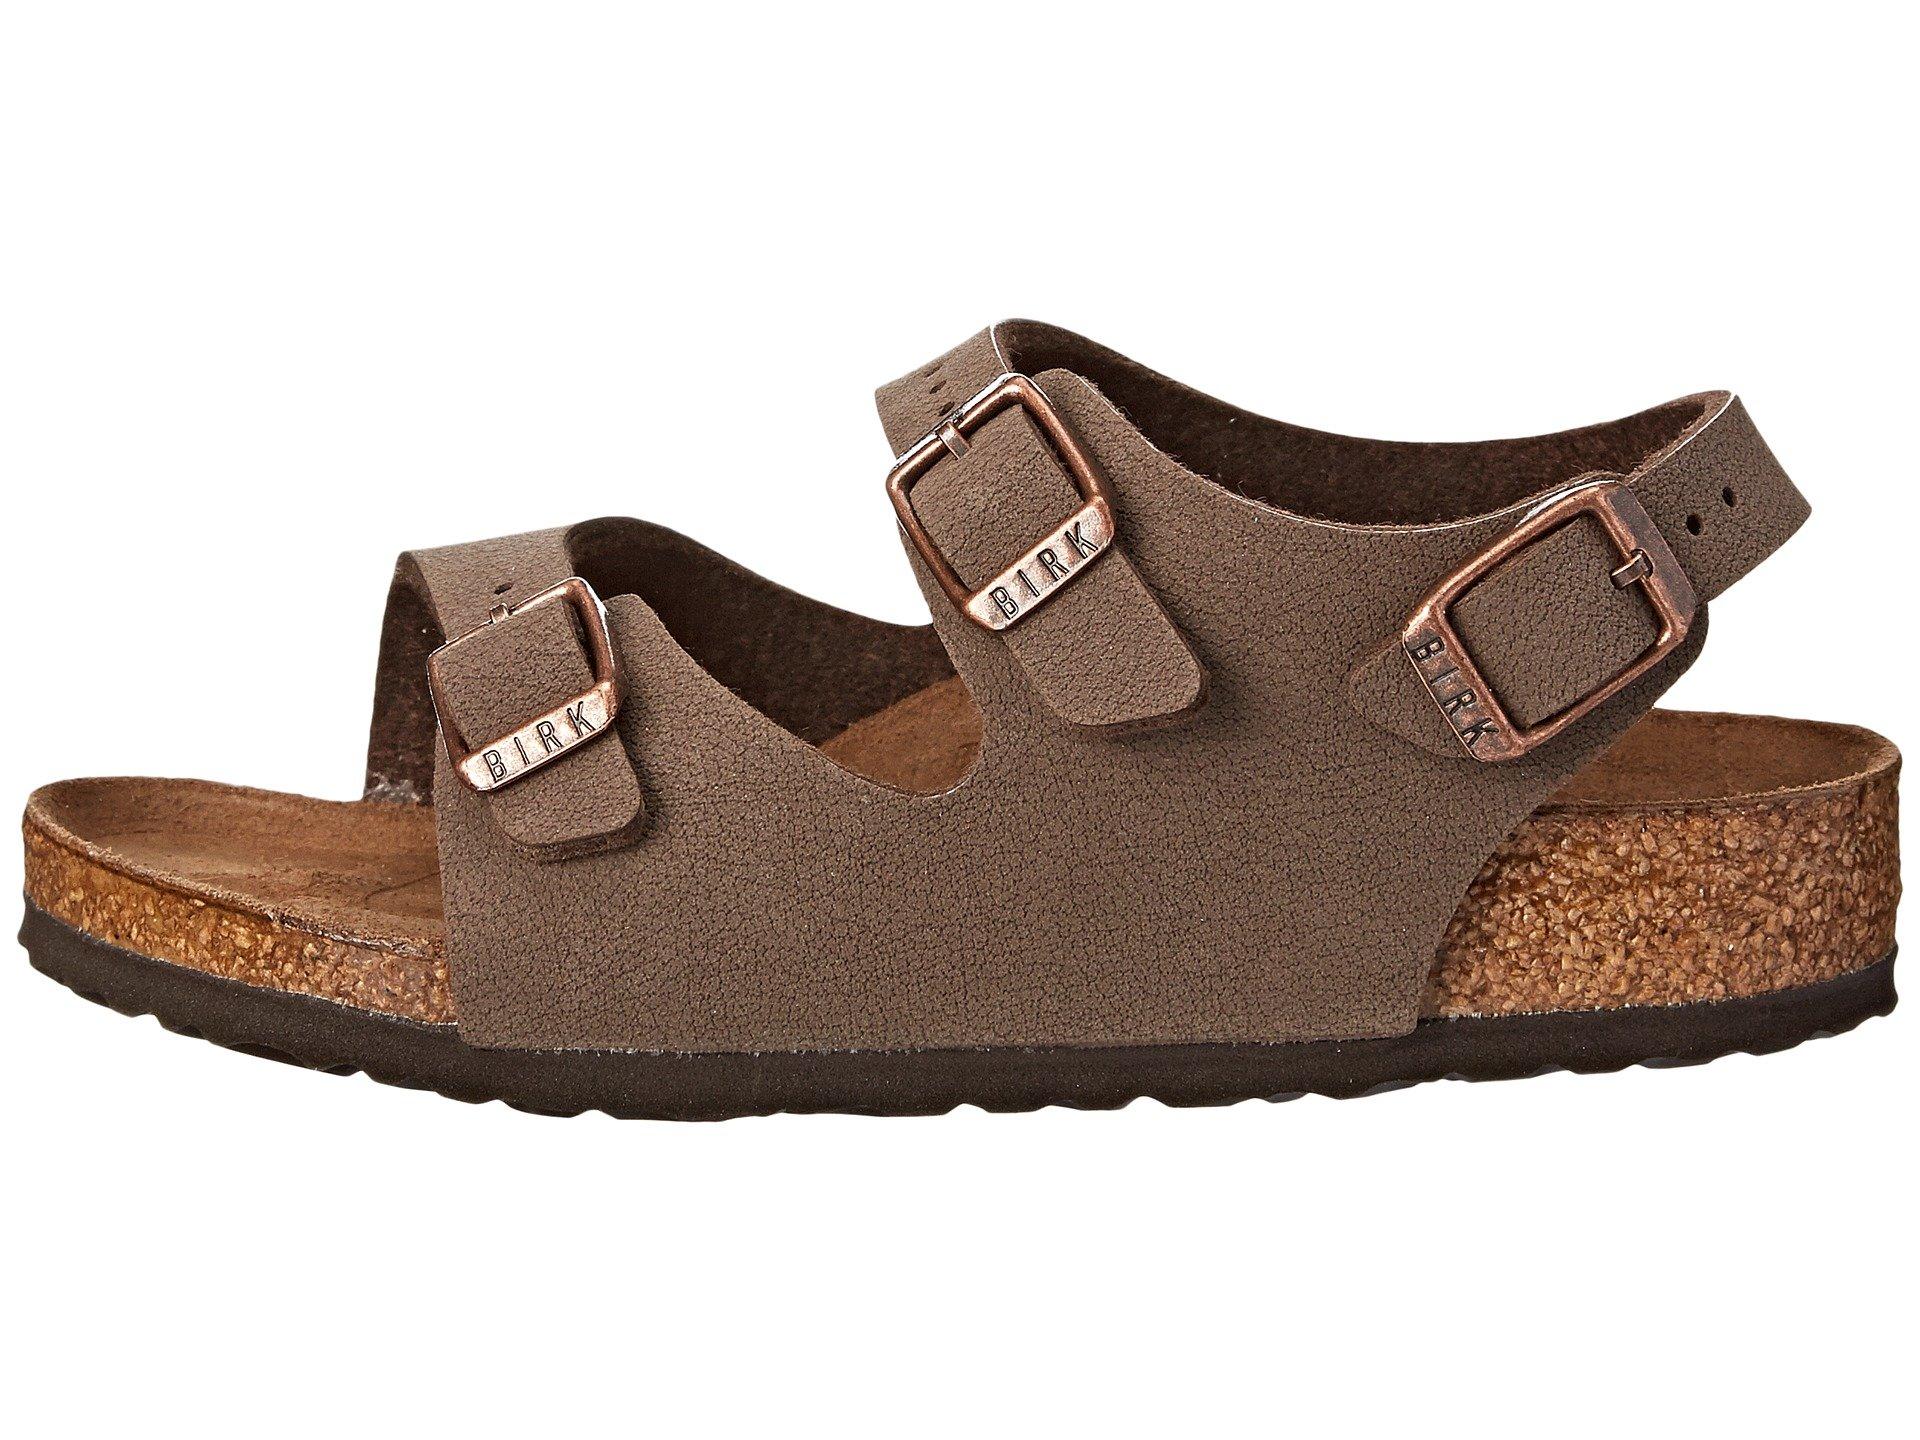 a8aba545dfb4 Discount Gray Birkenstock Orlando Sandals For Women